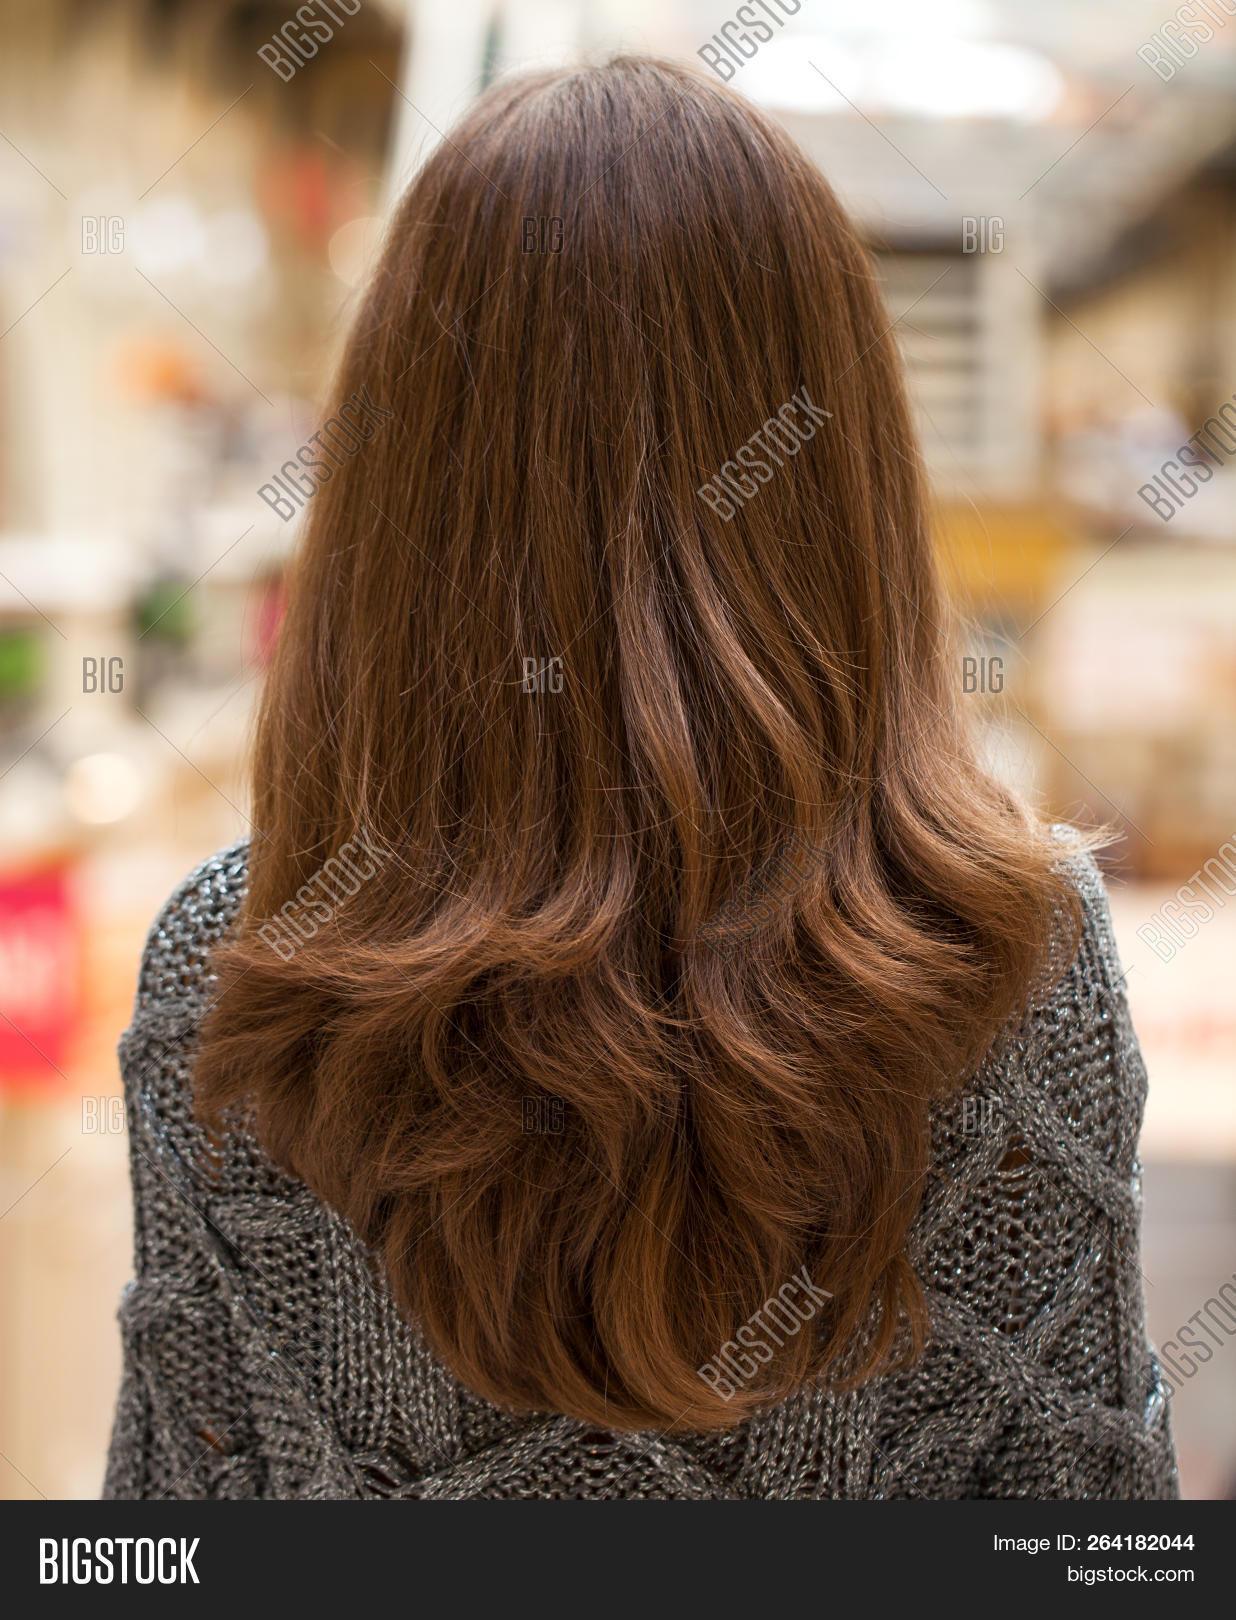 Female Long Wavy Hair Image Photo Free Trial Bigstock